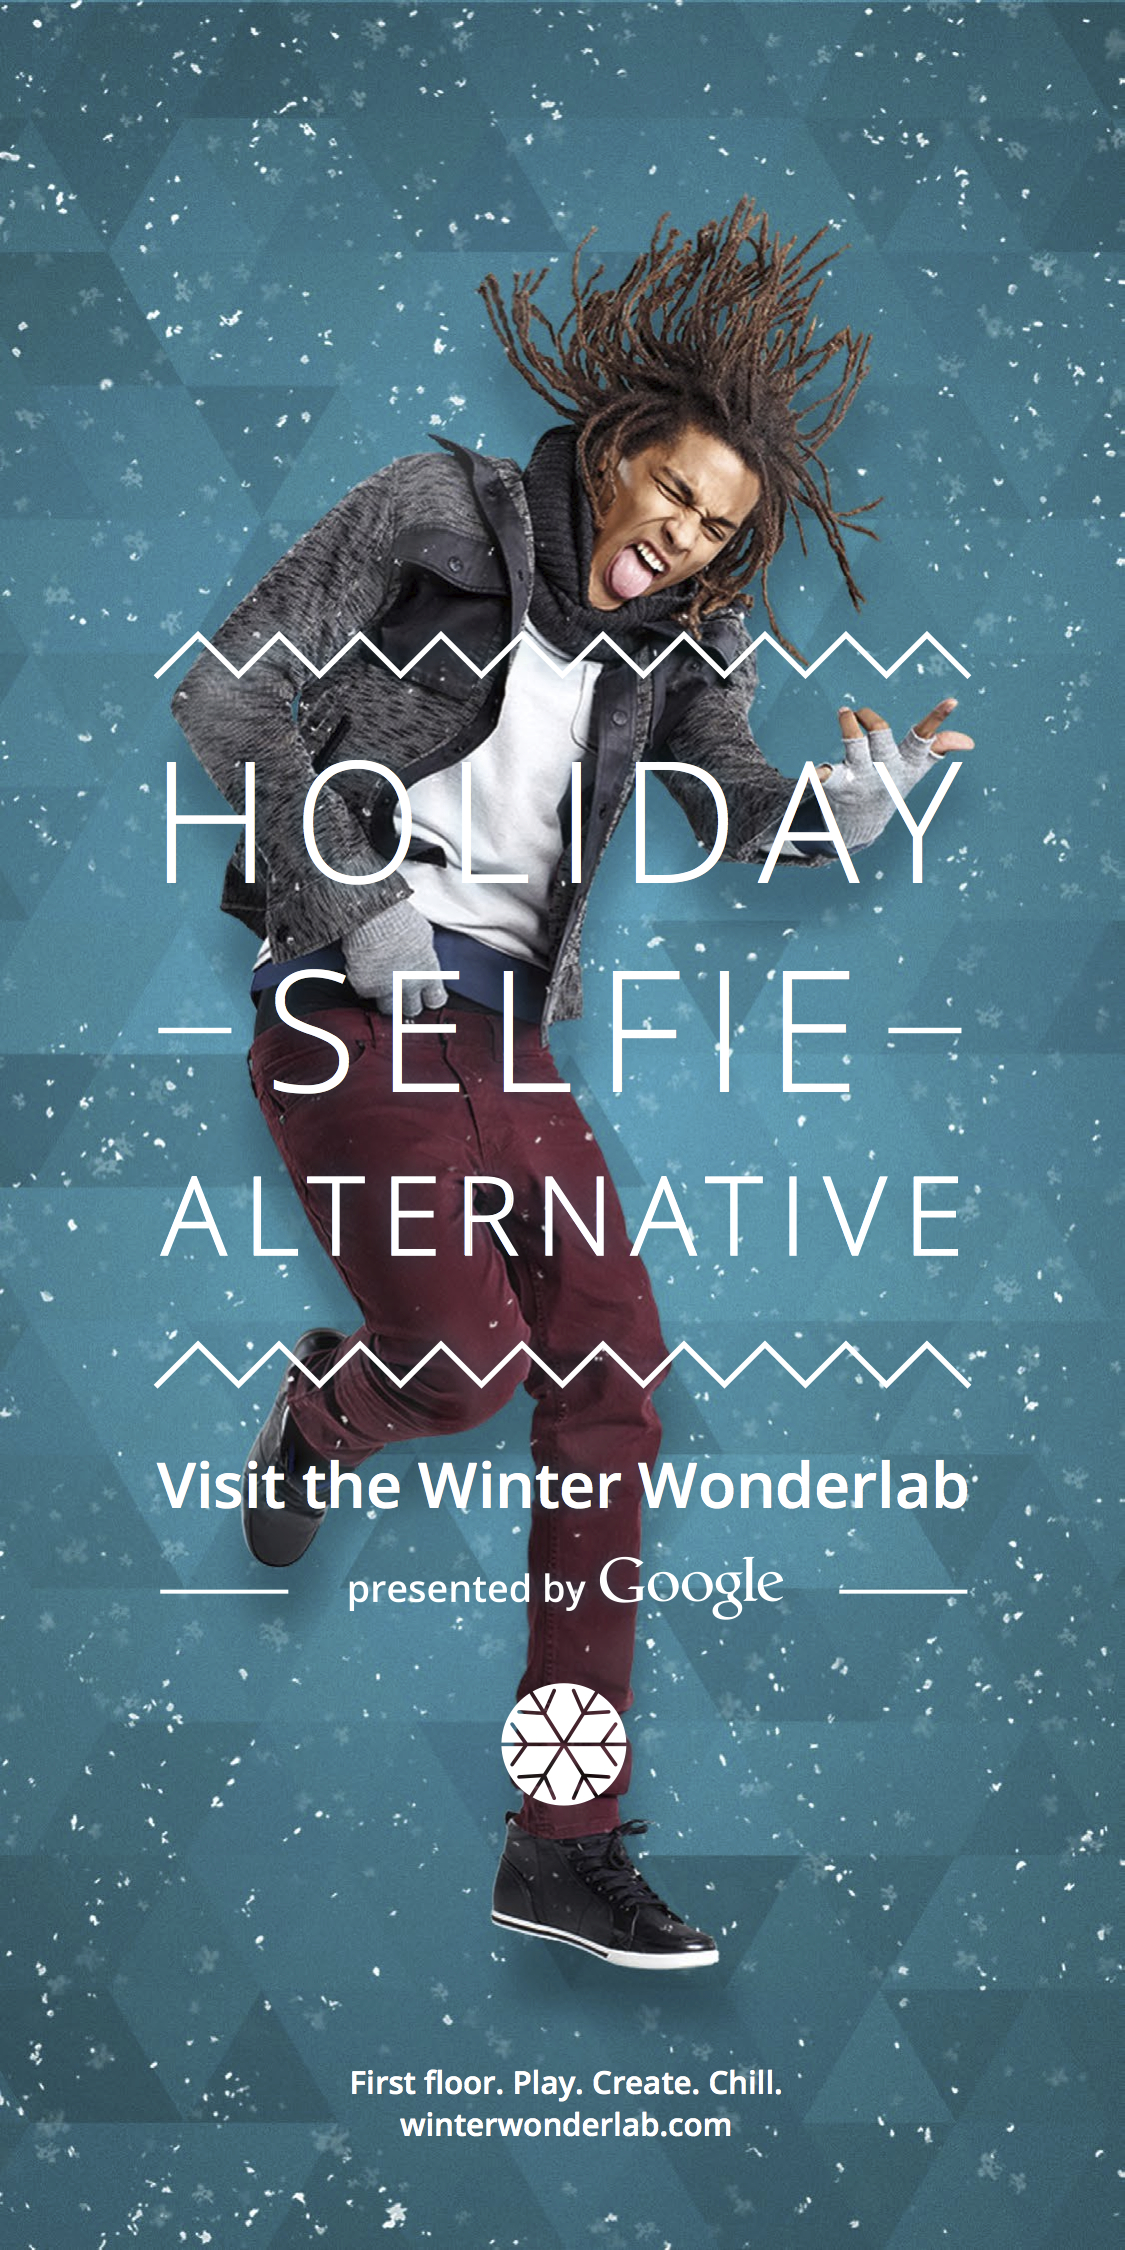 WWL — OOH selfie alt —small_pole_banner_60x30_v3.jpg